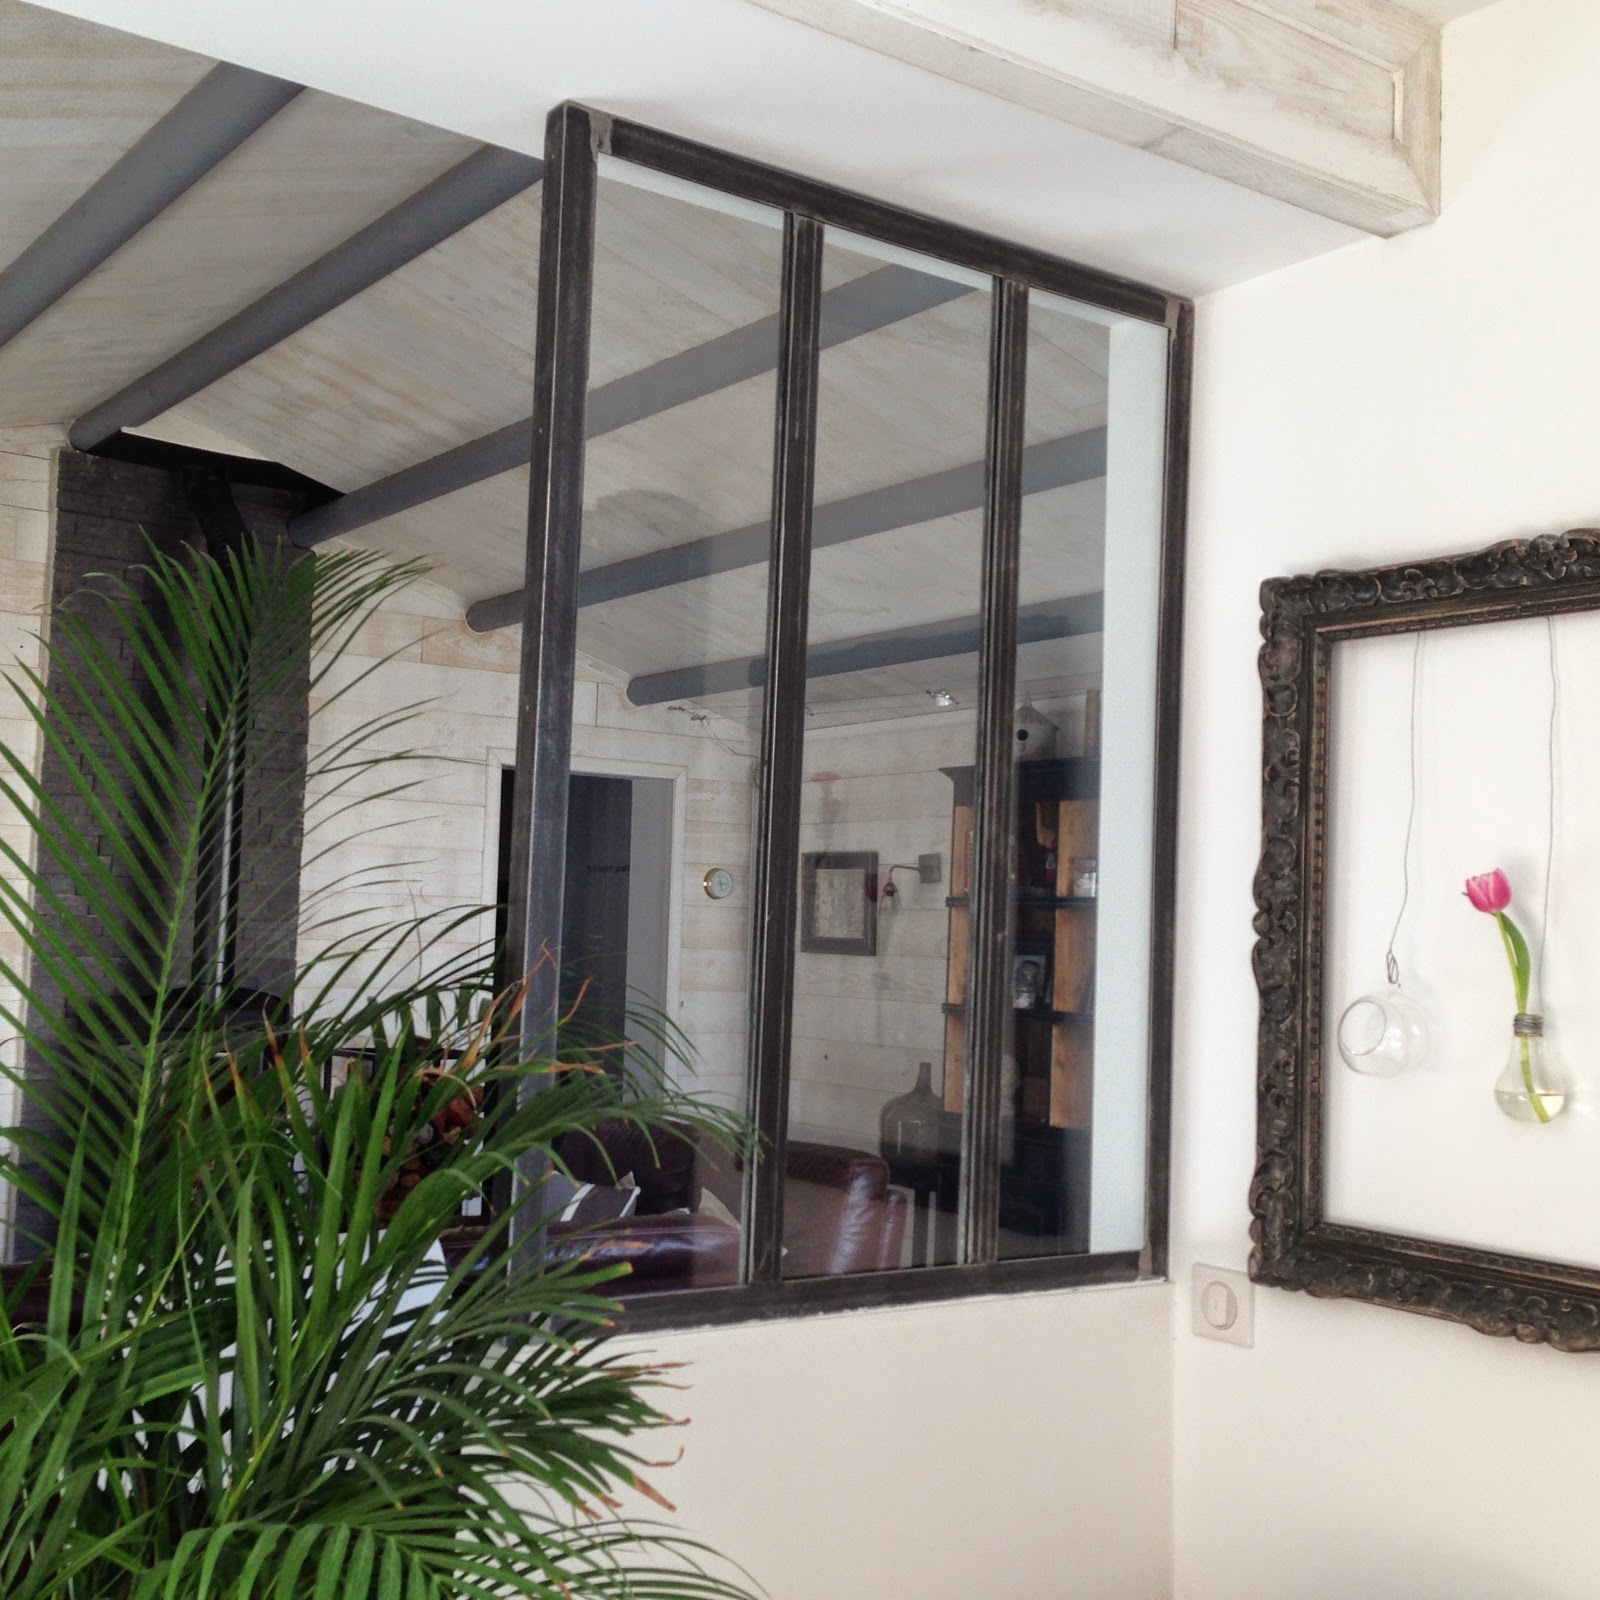 39 tite fabric d 39 o verri re type atelier d 39 artiste 120 90. Black Bedroom Furniture Sets. Home Design Ideas